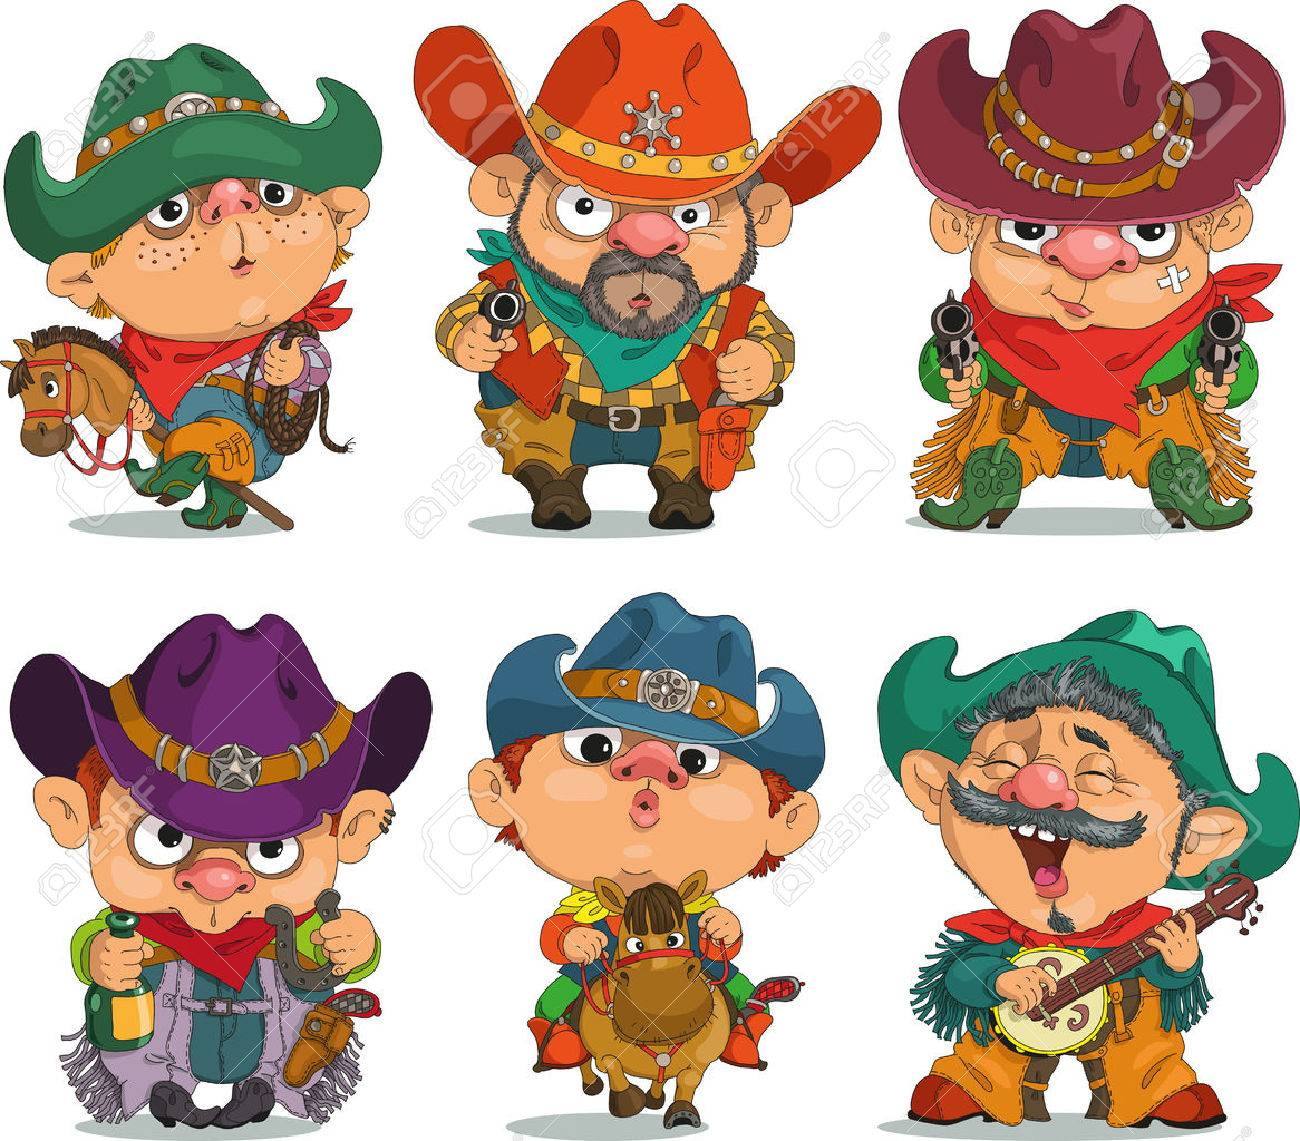 Cartoon cowboy. Funny cartoon. Characters. Cowboy set. Isolated objects. - 45835339